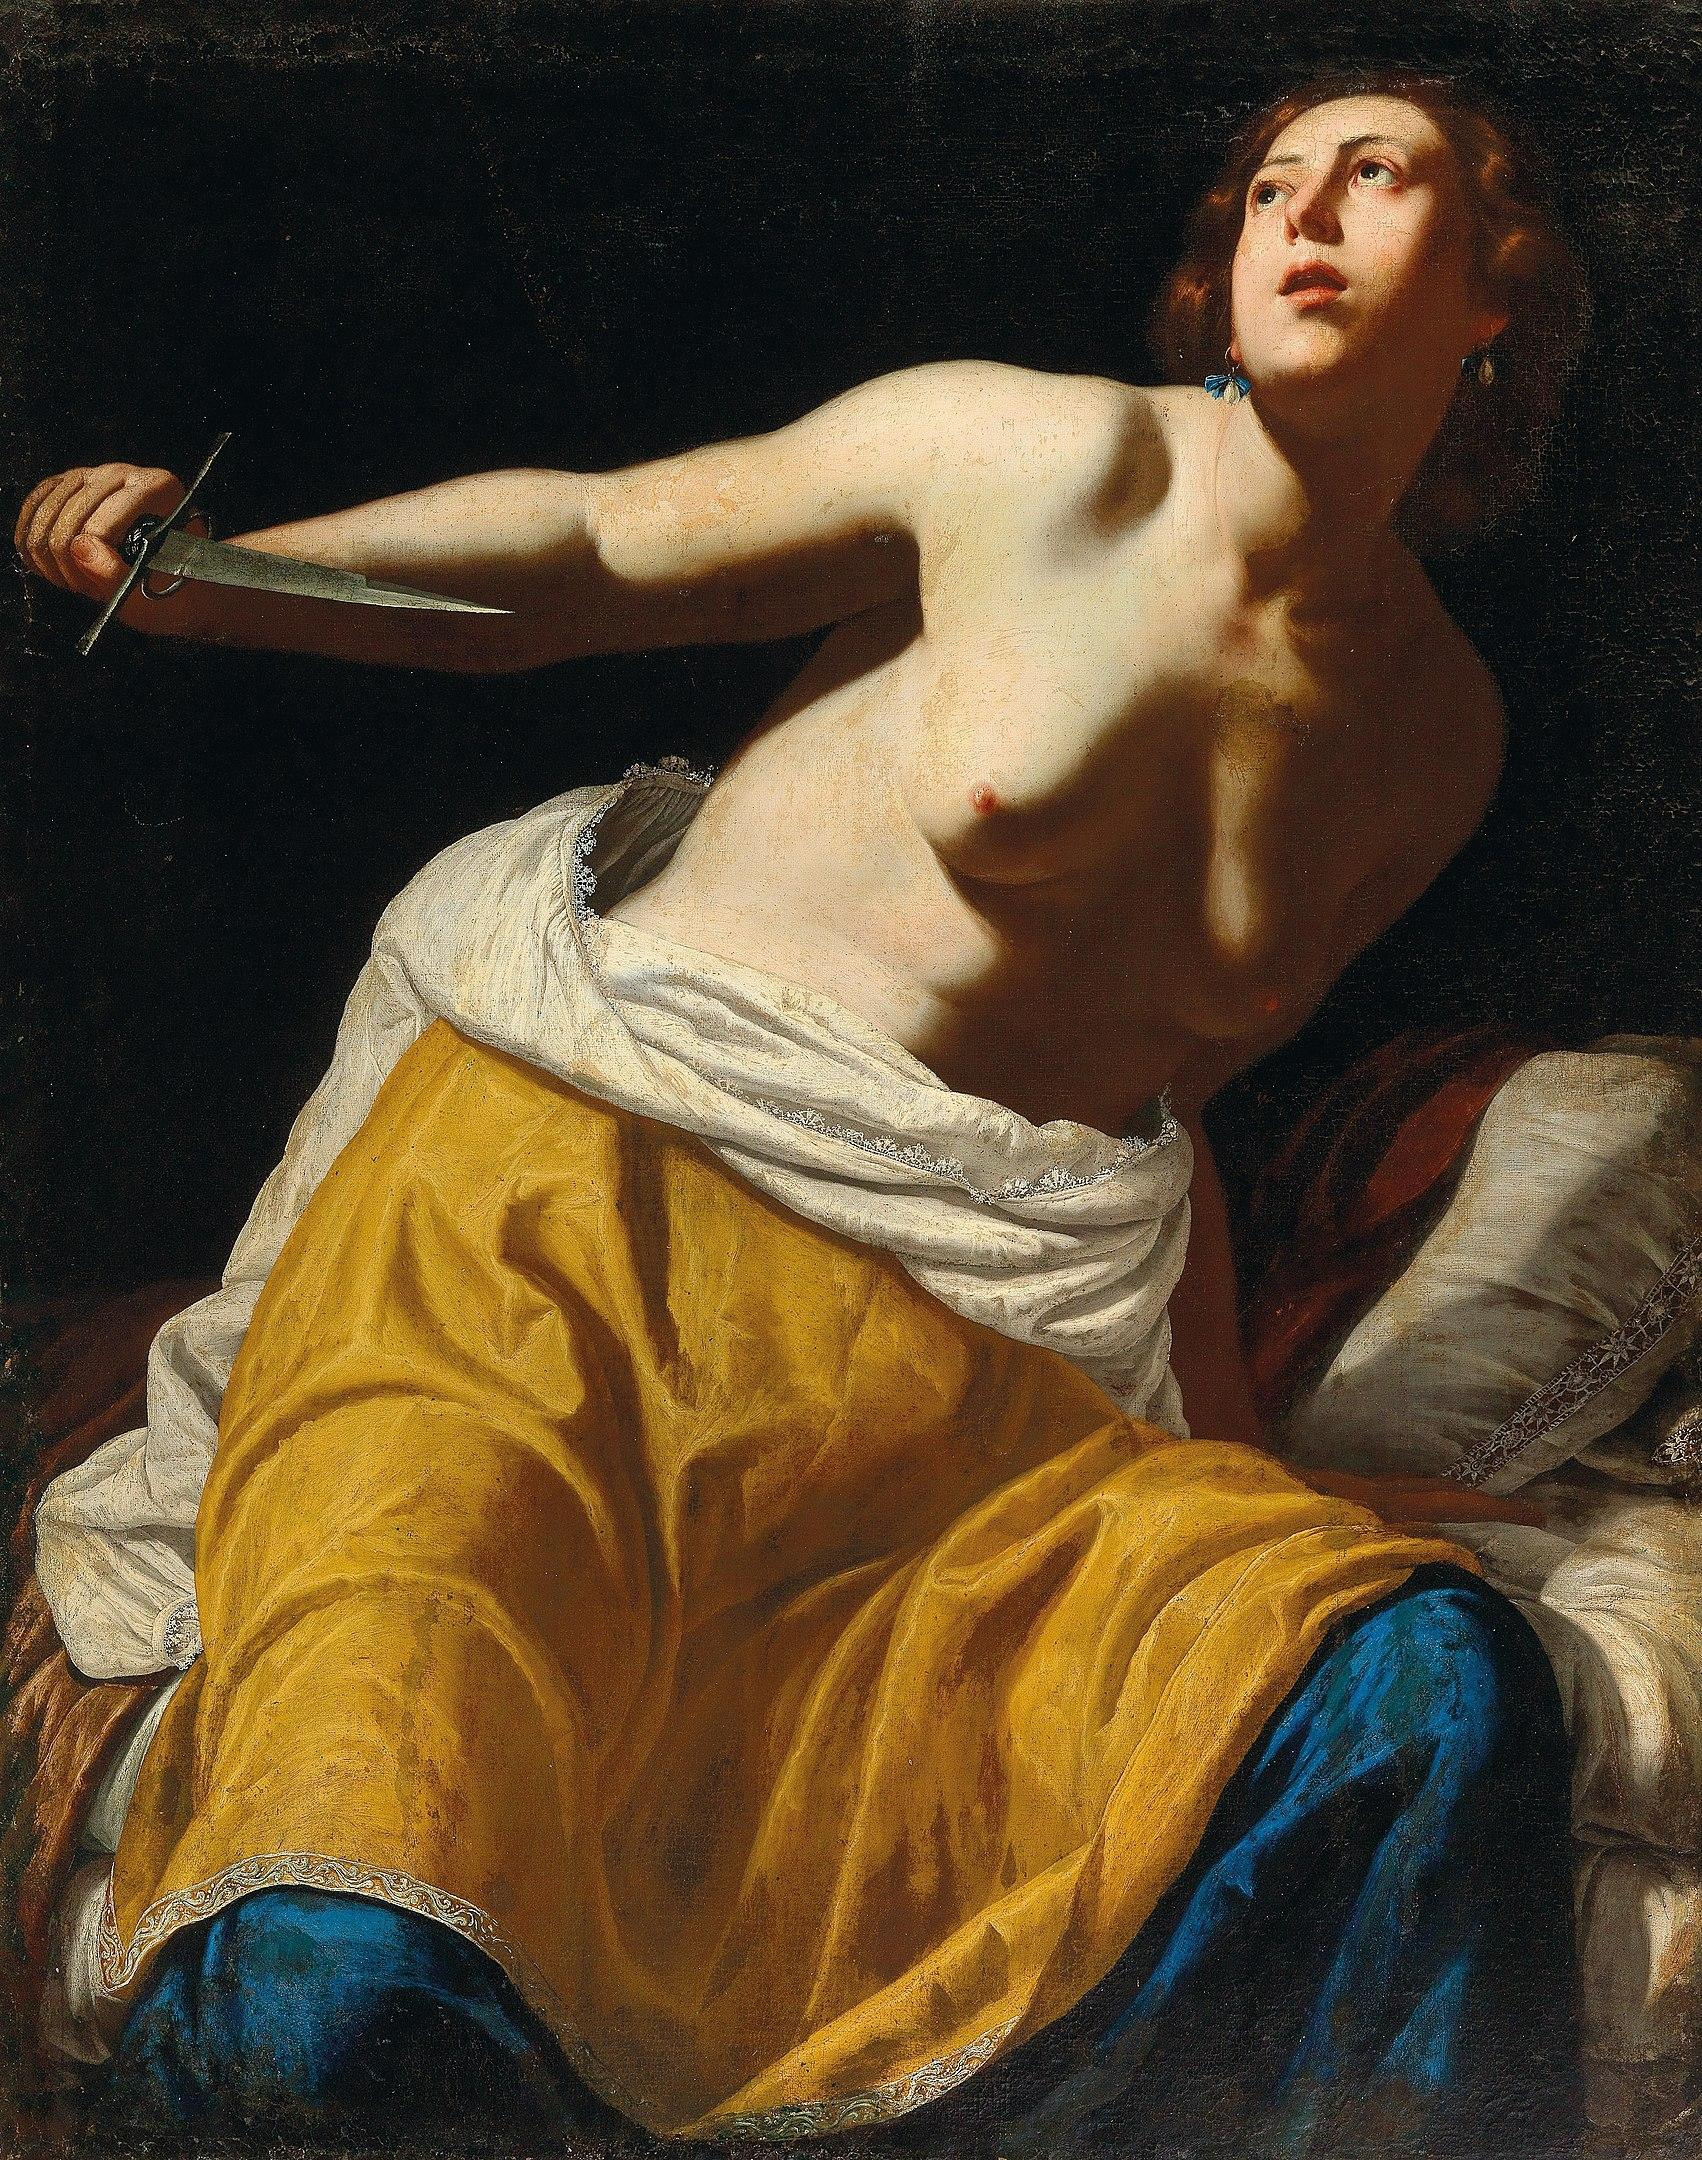 Gentileschi S Lost Lucretia Comes To Auction Art Object